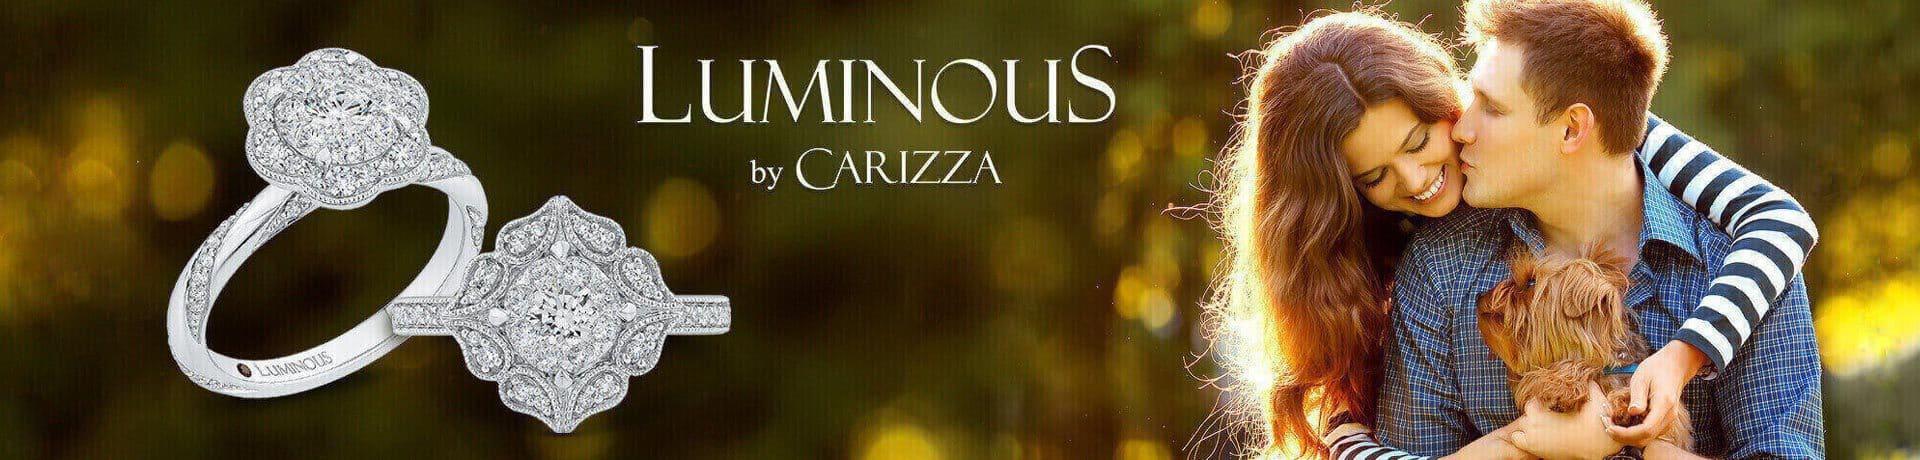 Carizza Luminous